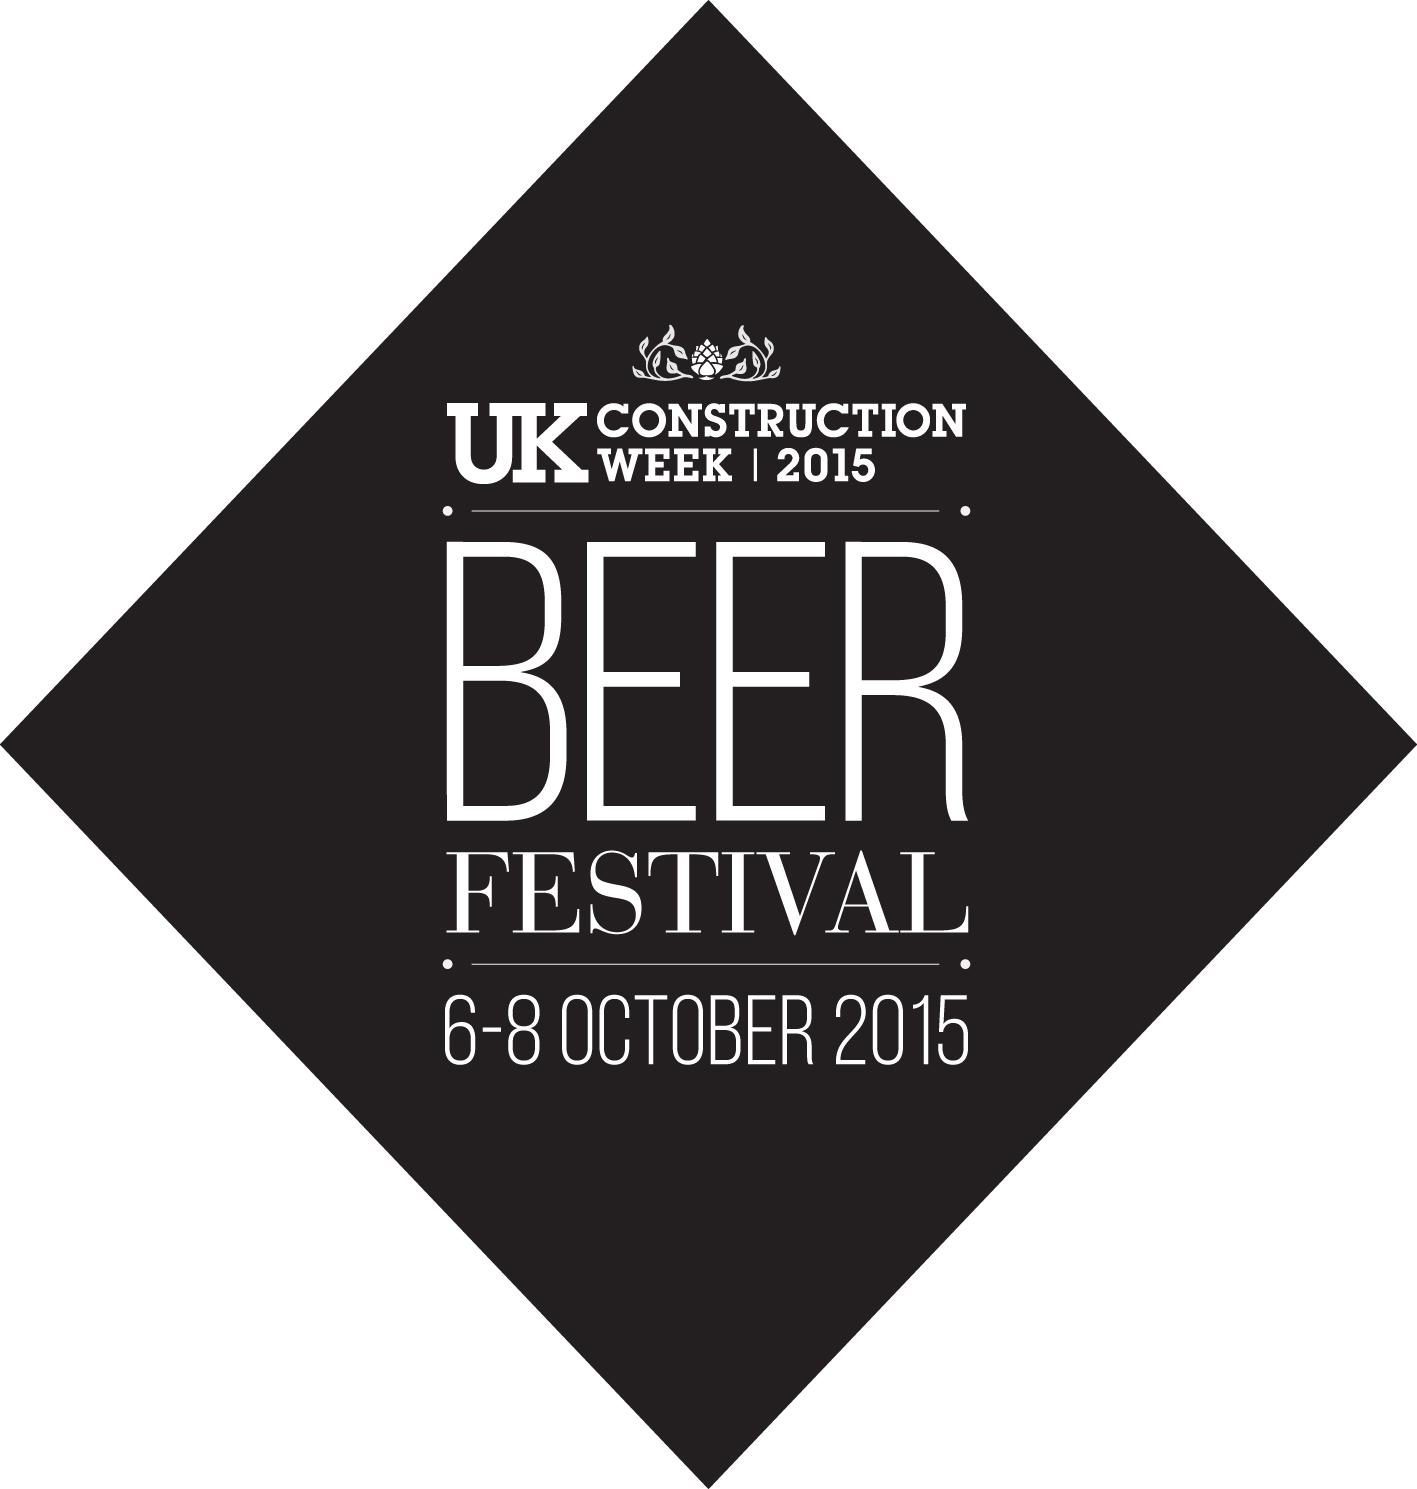 35675_UKCW-BeerFest-logo.jpg